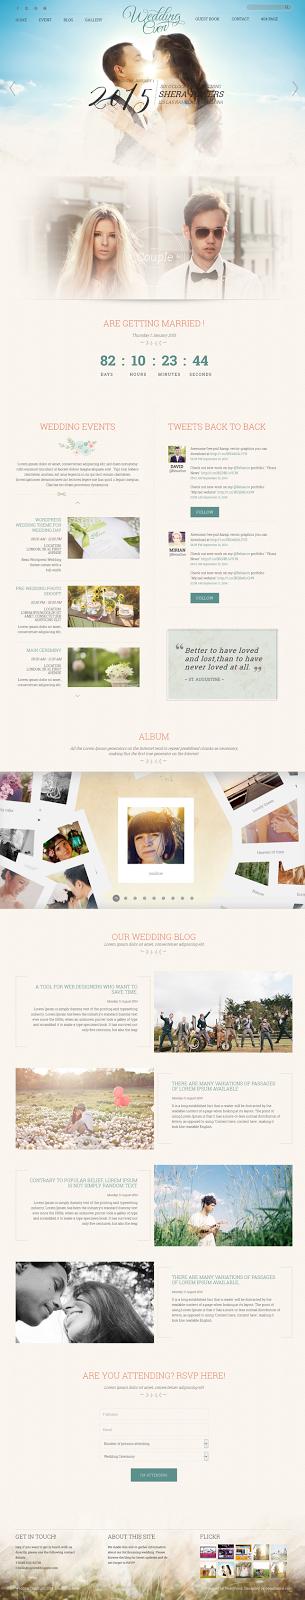 Free WordPress Wedding Website Theme